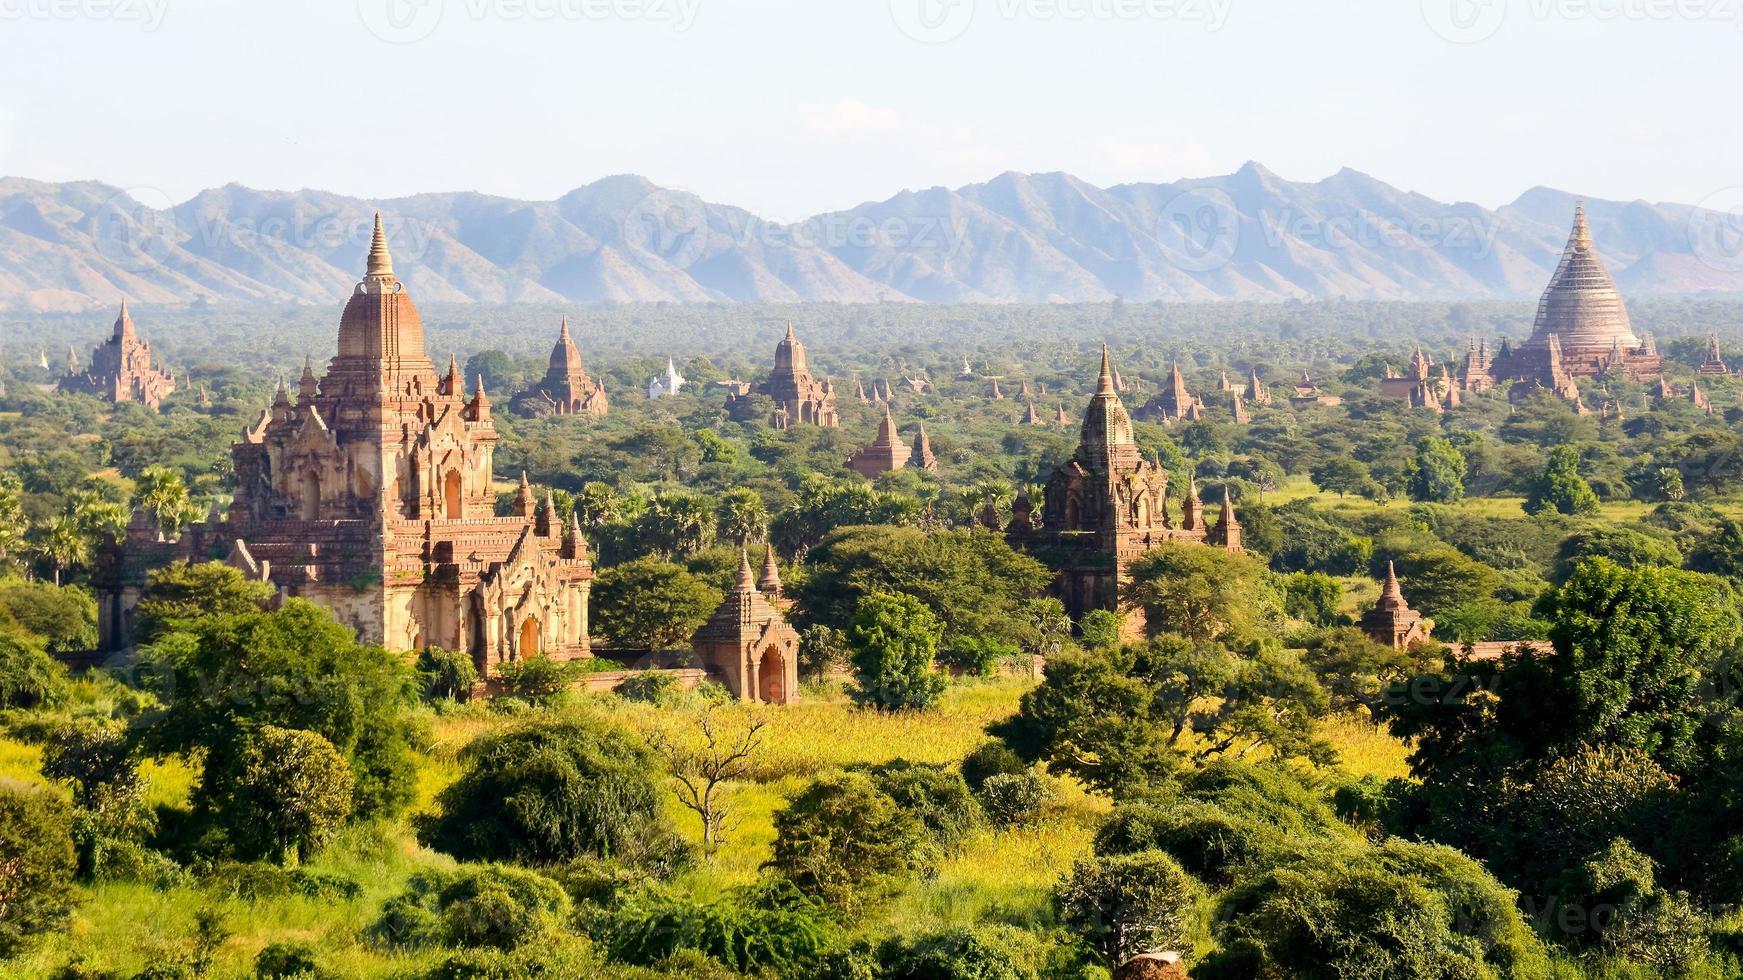 les temples de bagan, myanmar photo